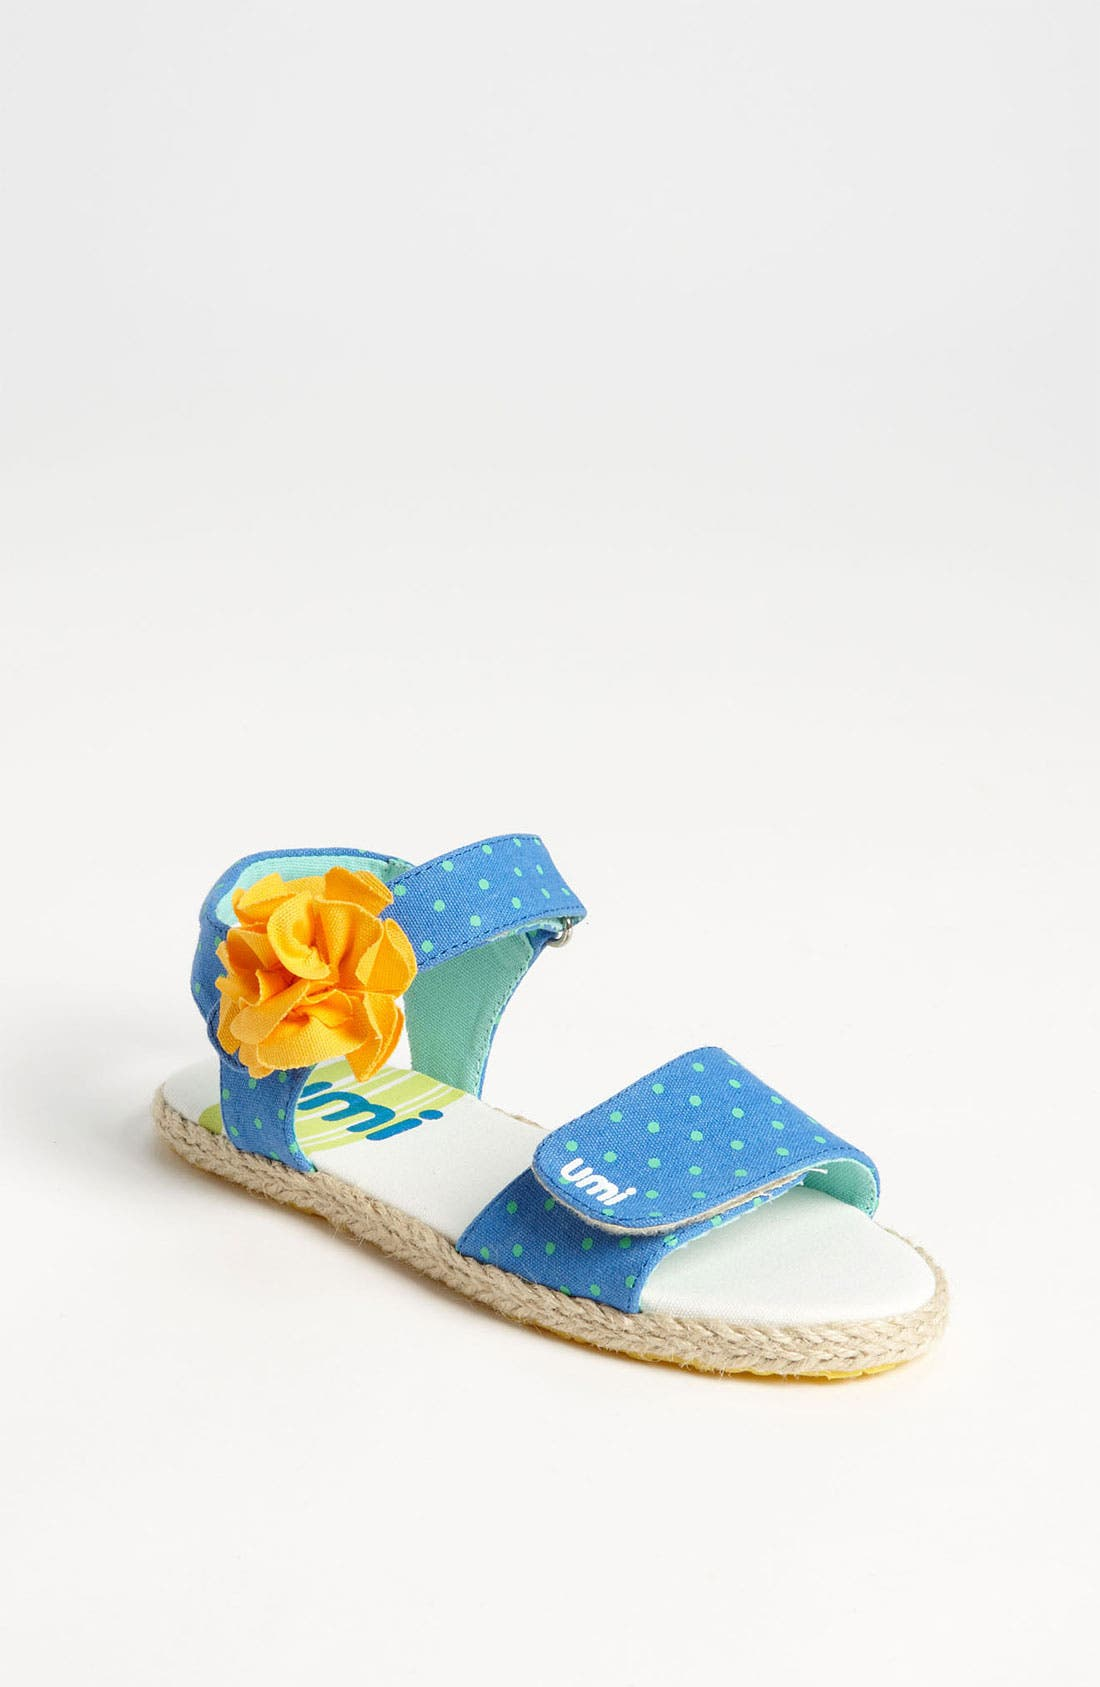 Alternate Image 1 Selected - Umi 'Giselle' Sandal (Toddler, Little Kid & Big Kid)